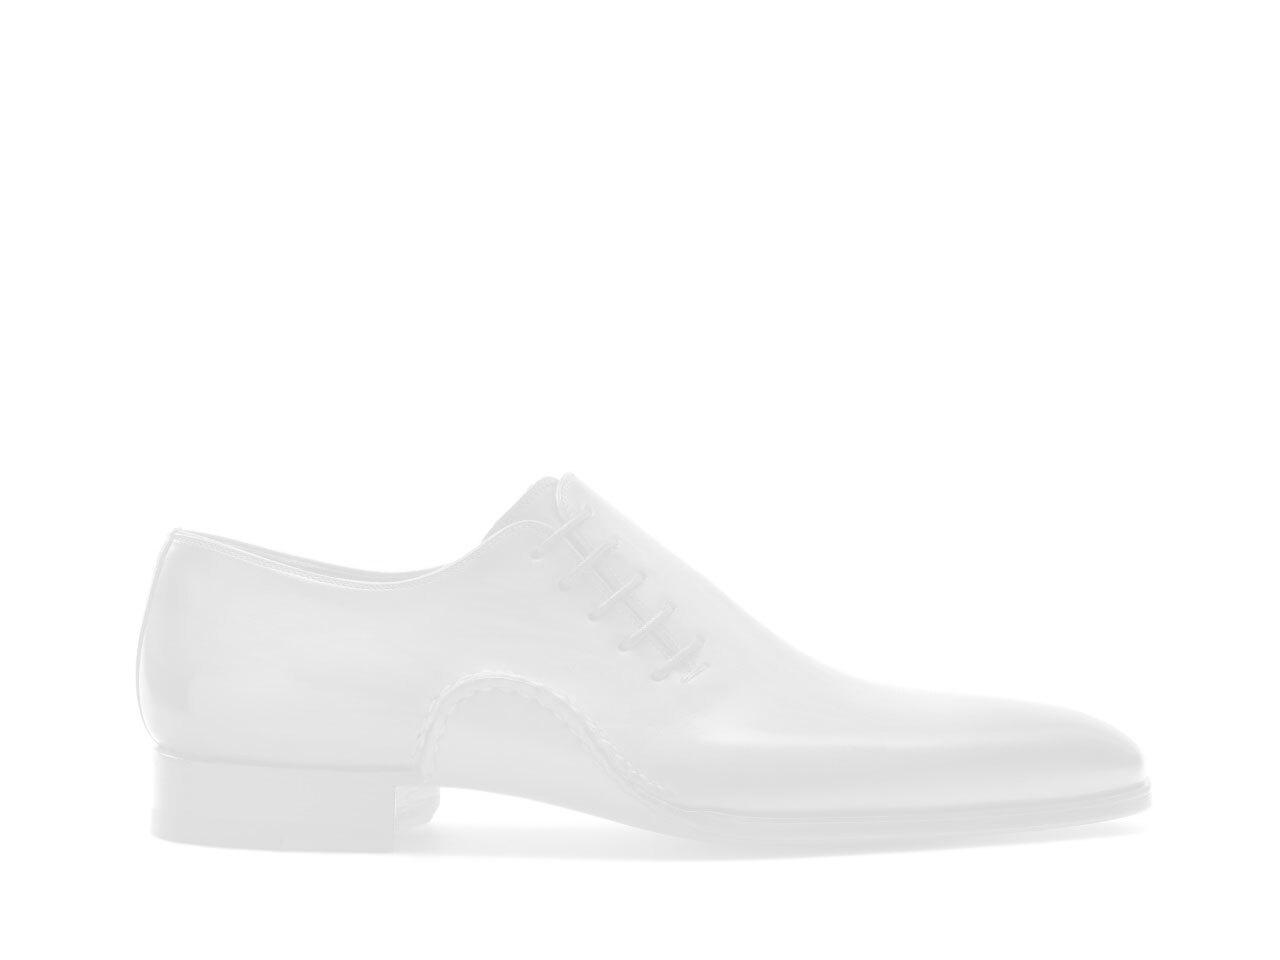 Pair of the Magnanni Lizandro Cuero Men's Sneakers